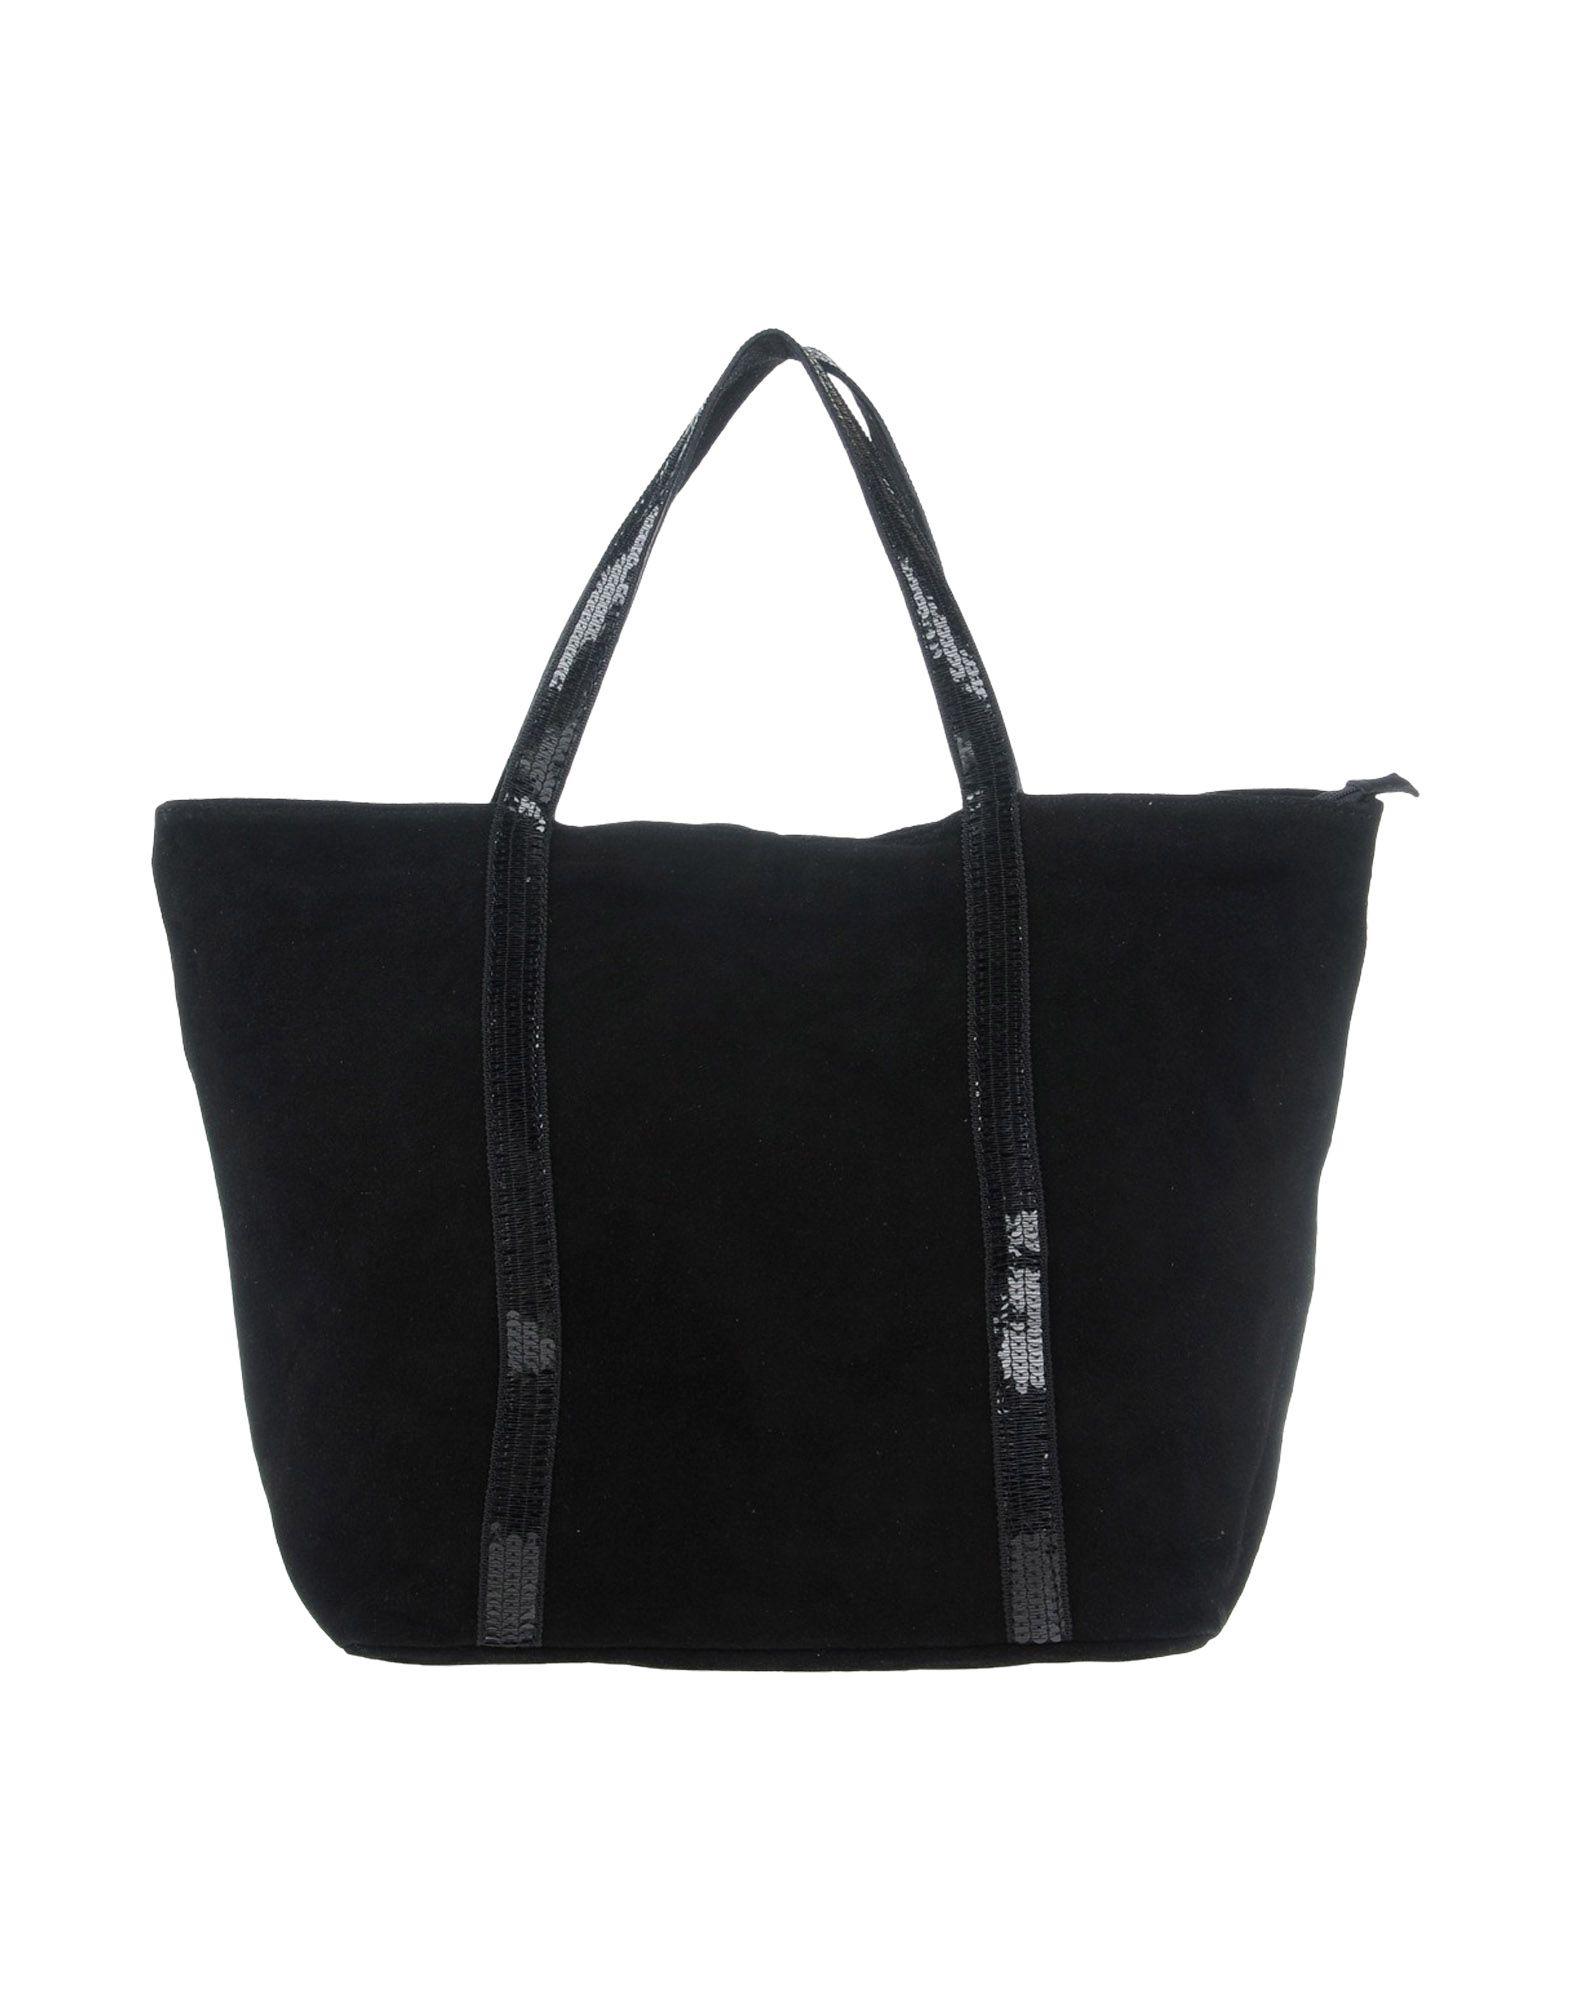 'GIADA PELLE Handbags